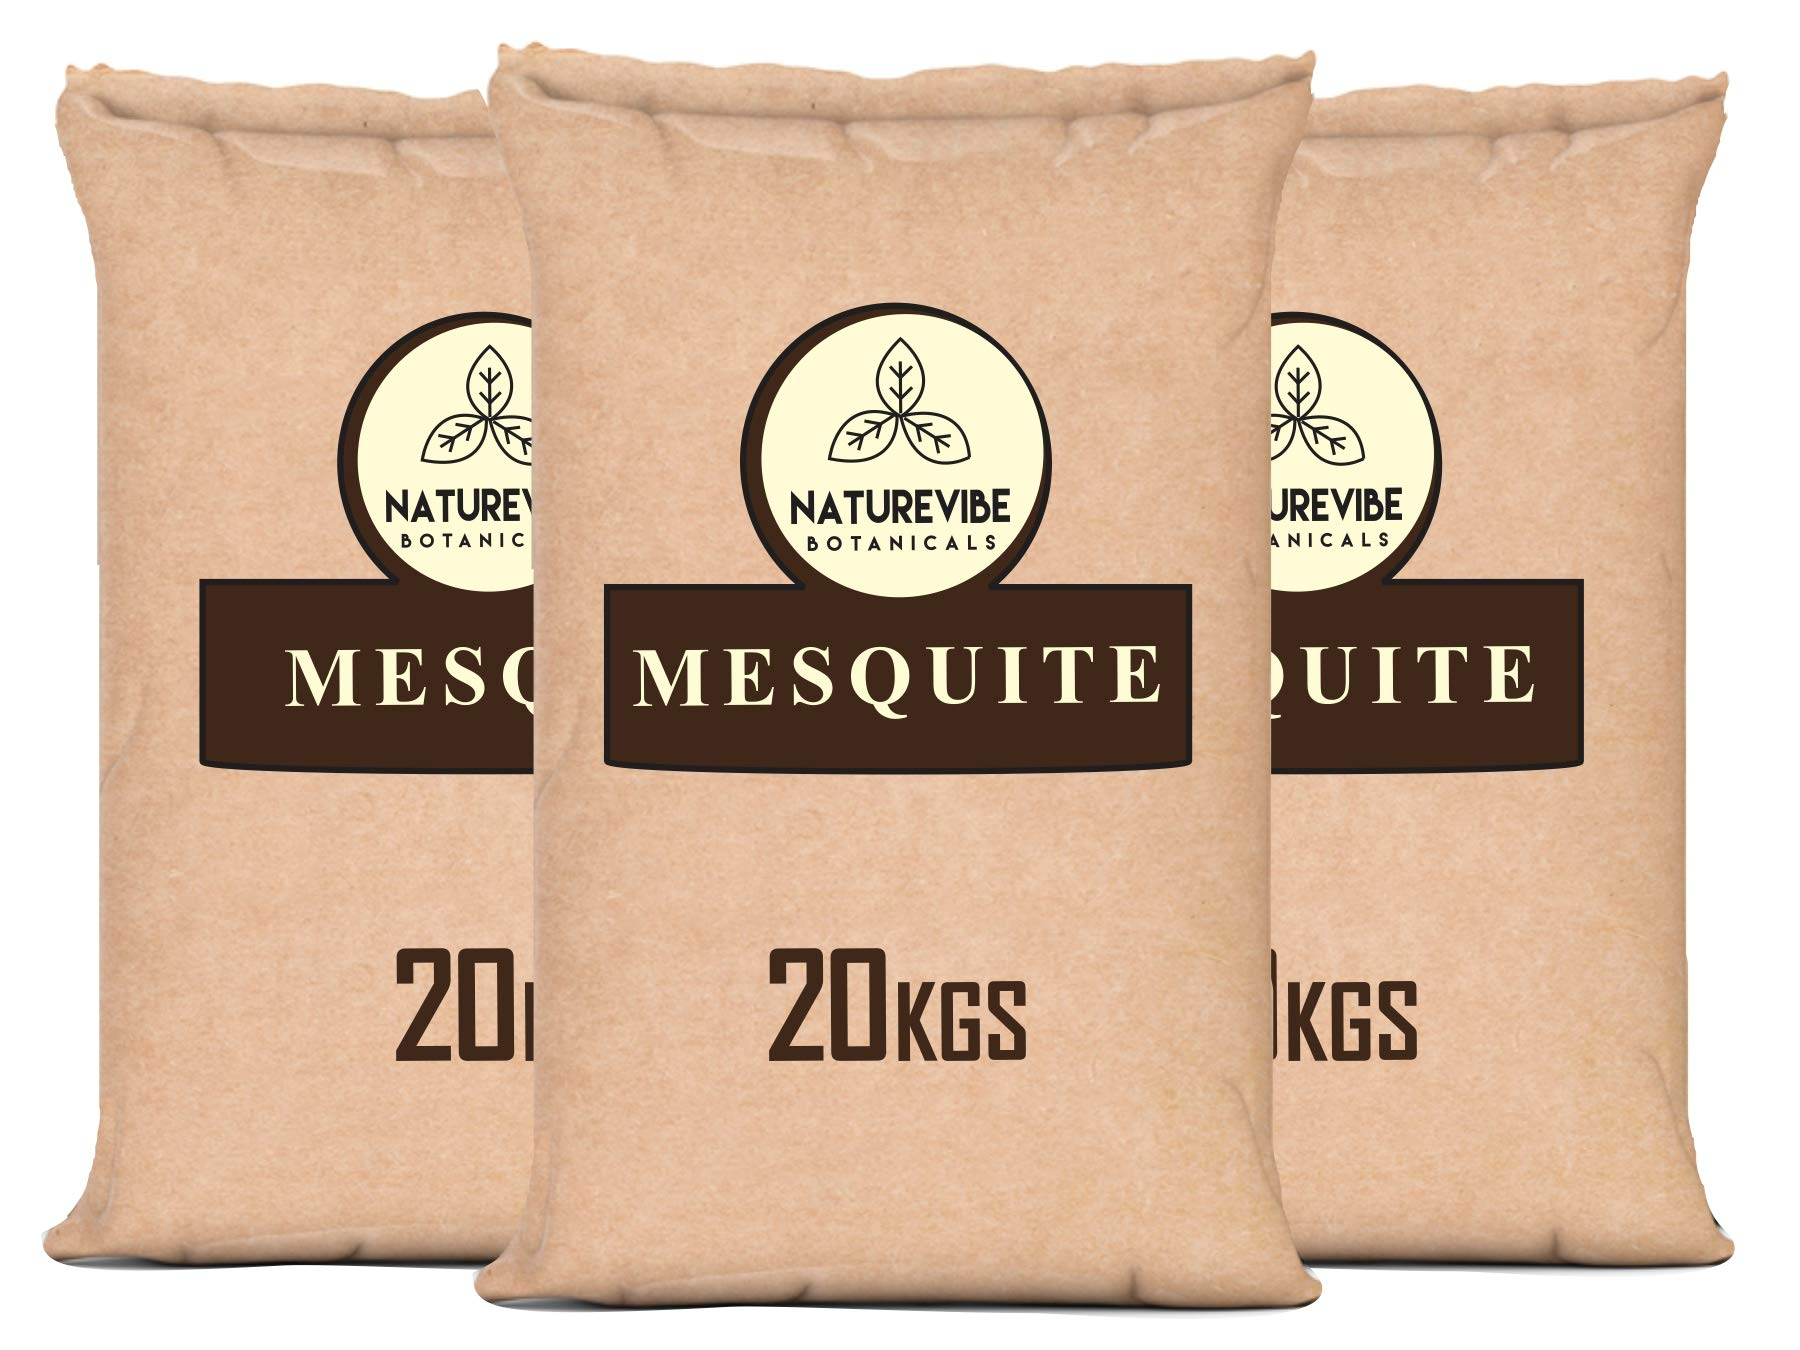 Naturevibe Botanicals Organic Mesquite Powder 44 lbs, 20 kg Paper Bulk Bag… by Naturevibe Botanicals (Image #1)